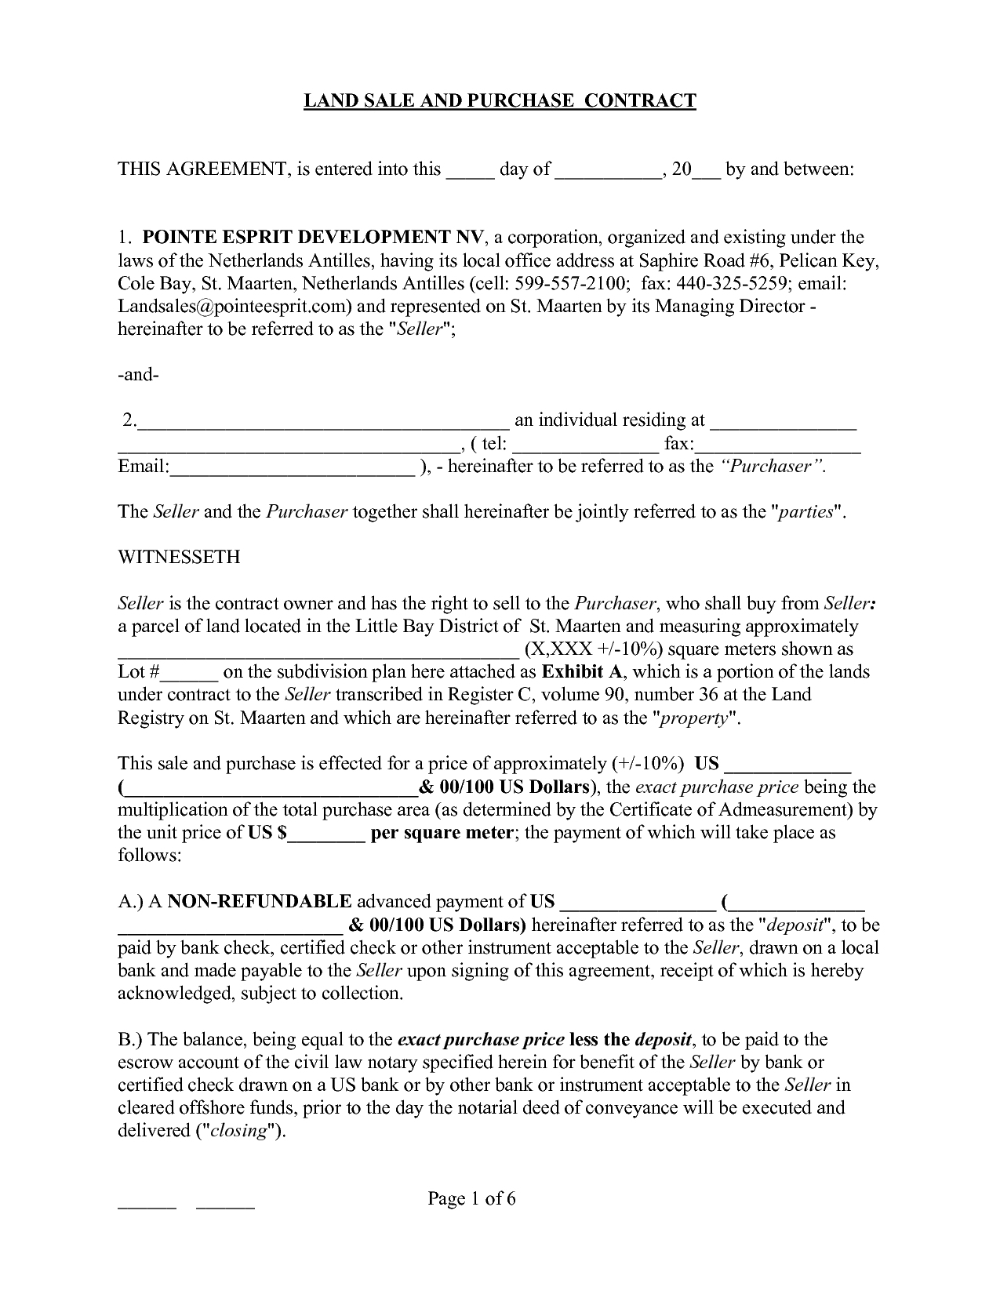 Data Virginia Prenuptial Agreement Forms Id Opendata Within Islamic Prenuptial Agreement Template 10 Profes Prenuptial Agreement Prenuptial Prenup Agreement